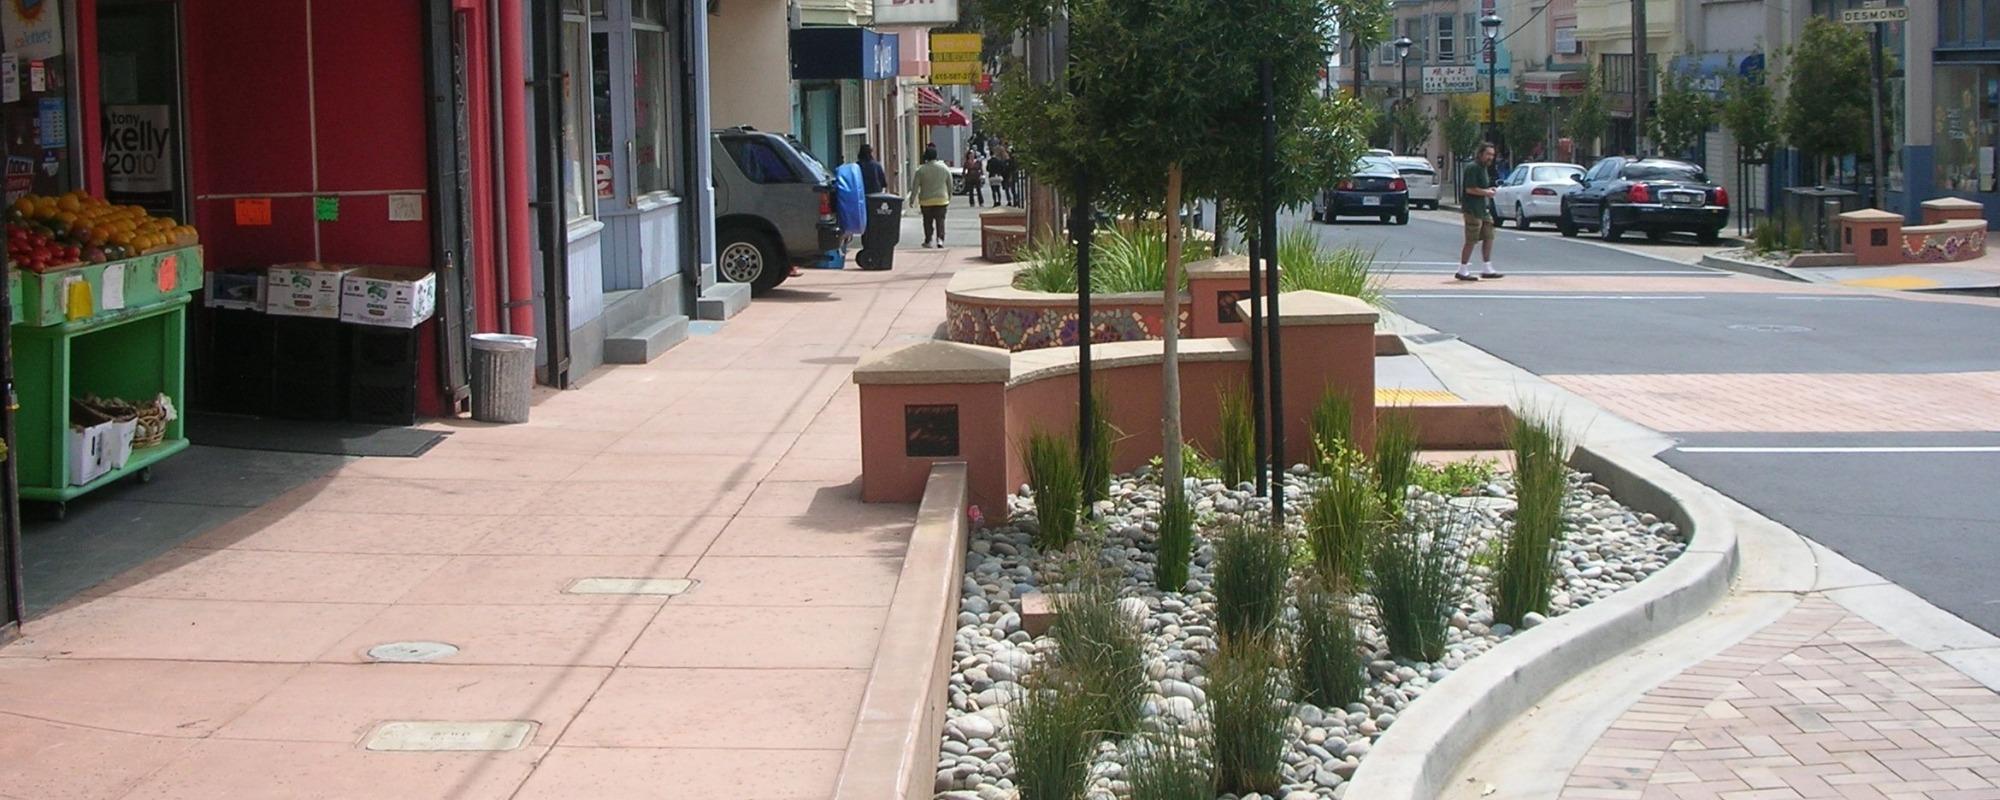 Leland Avenue Streetscape Improvement Project